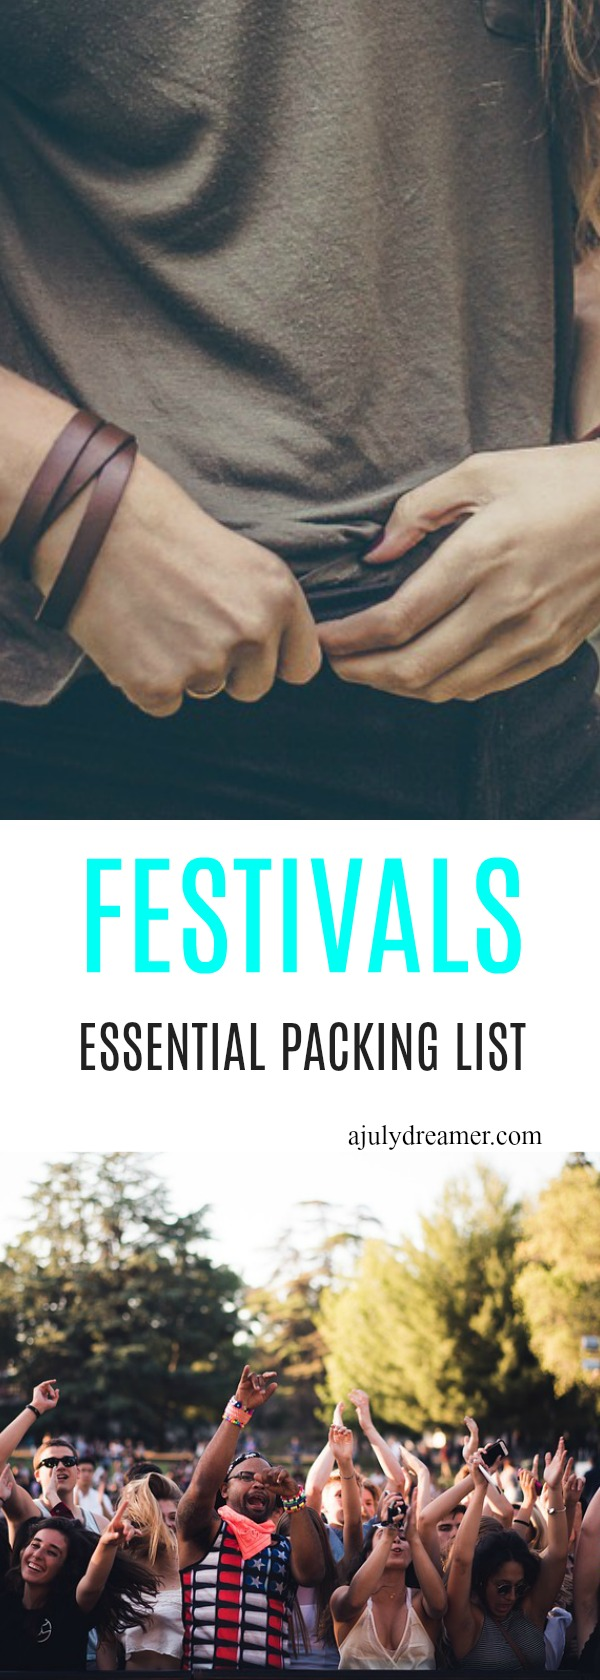 ultimate festival packing list